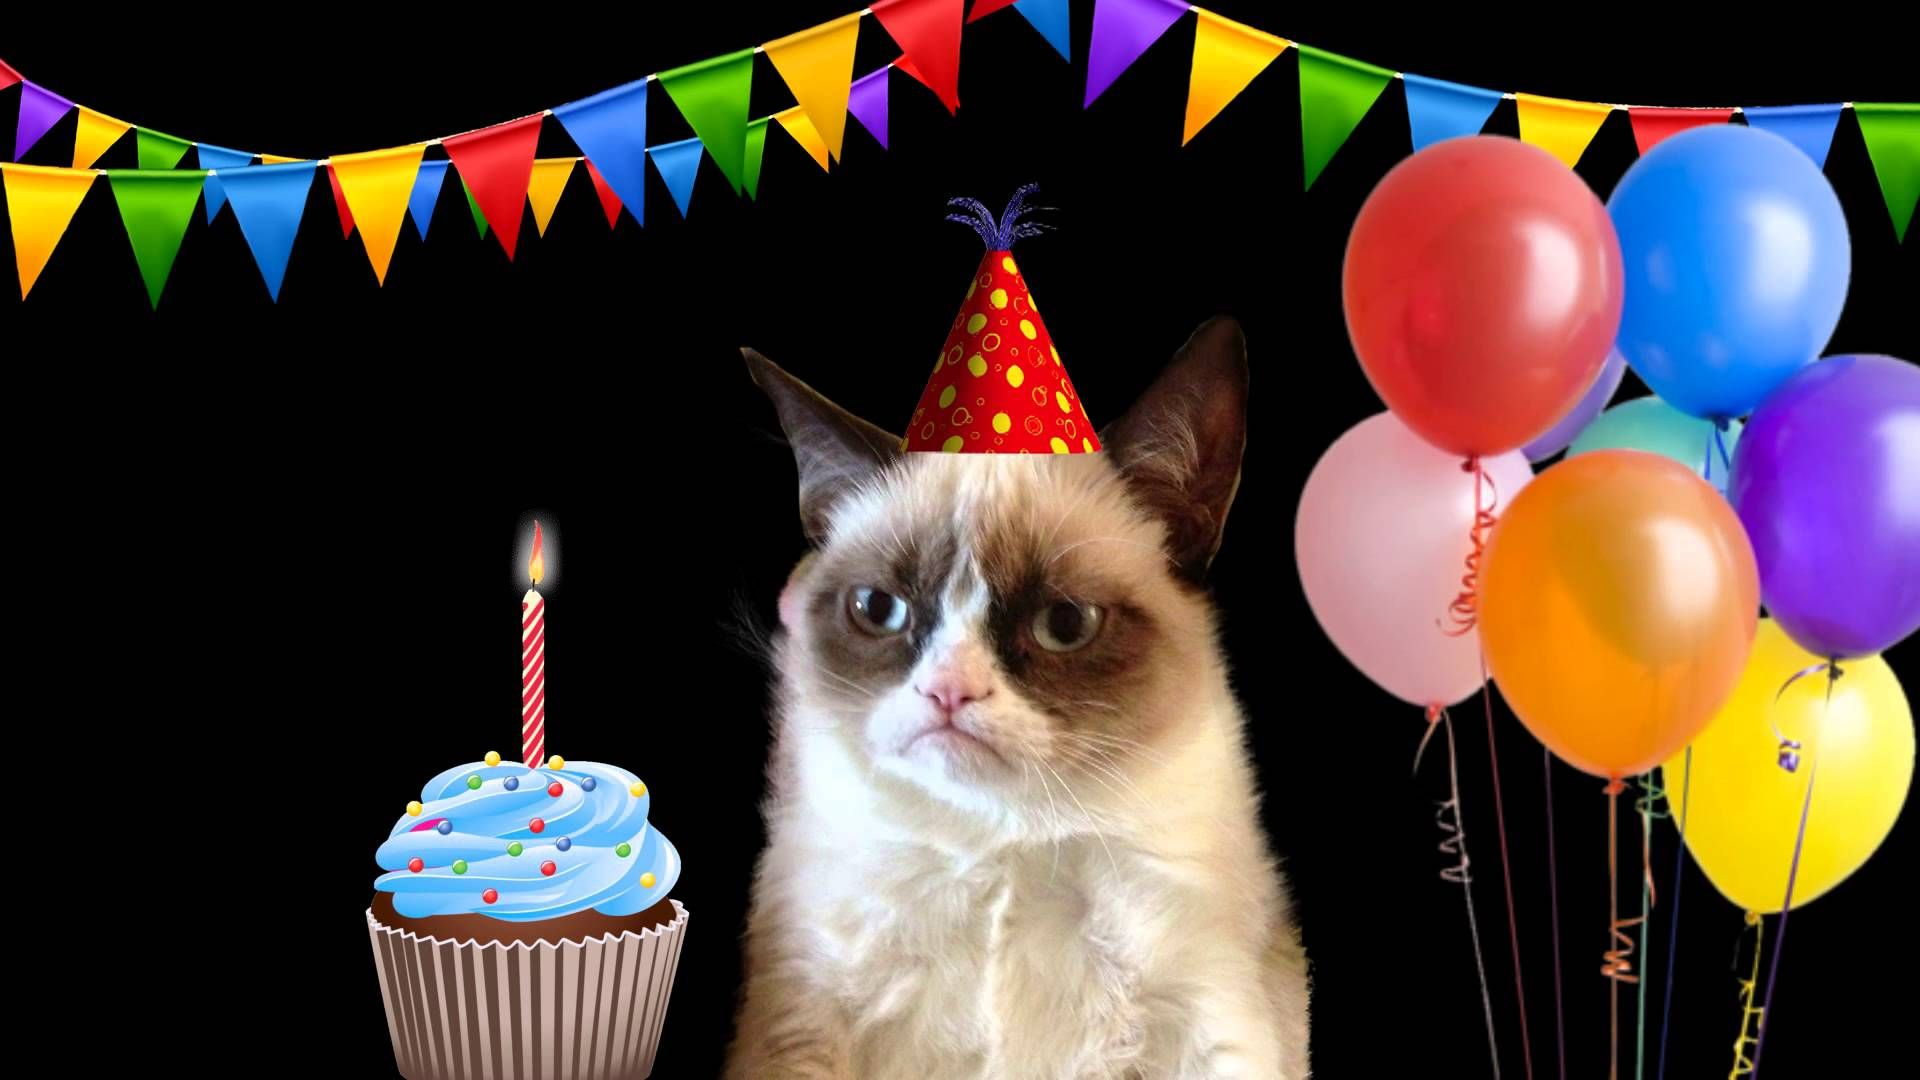 Happy Birthday Song by Grumpy Cat Grumpy cat birthday